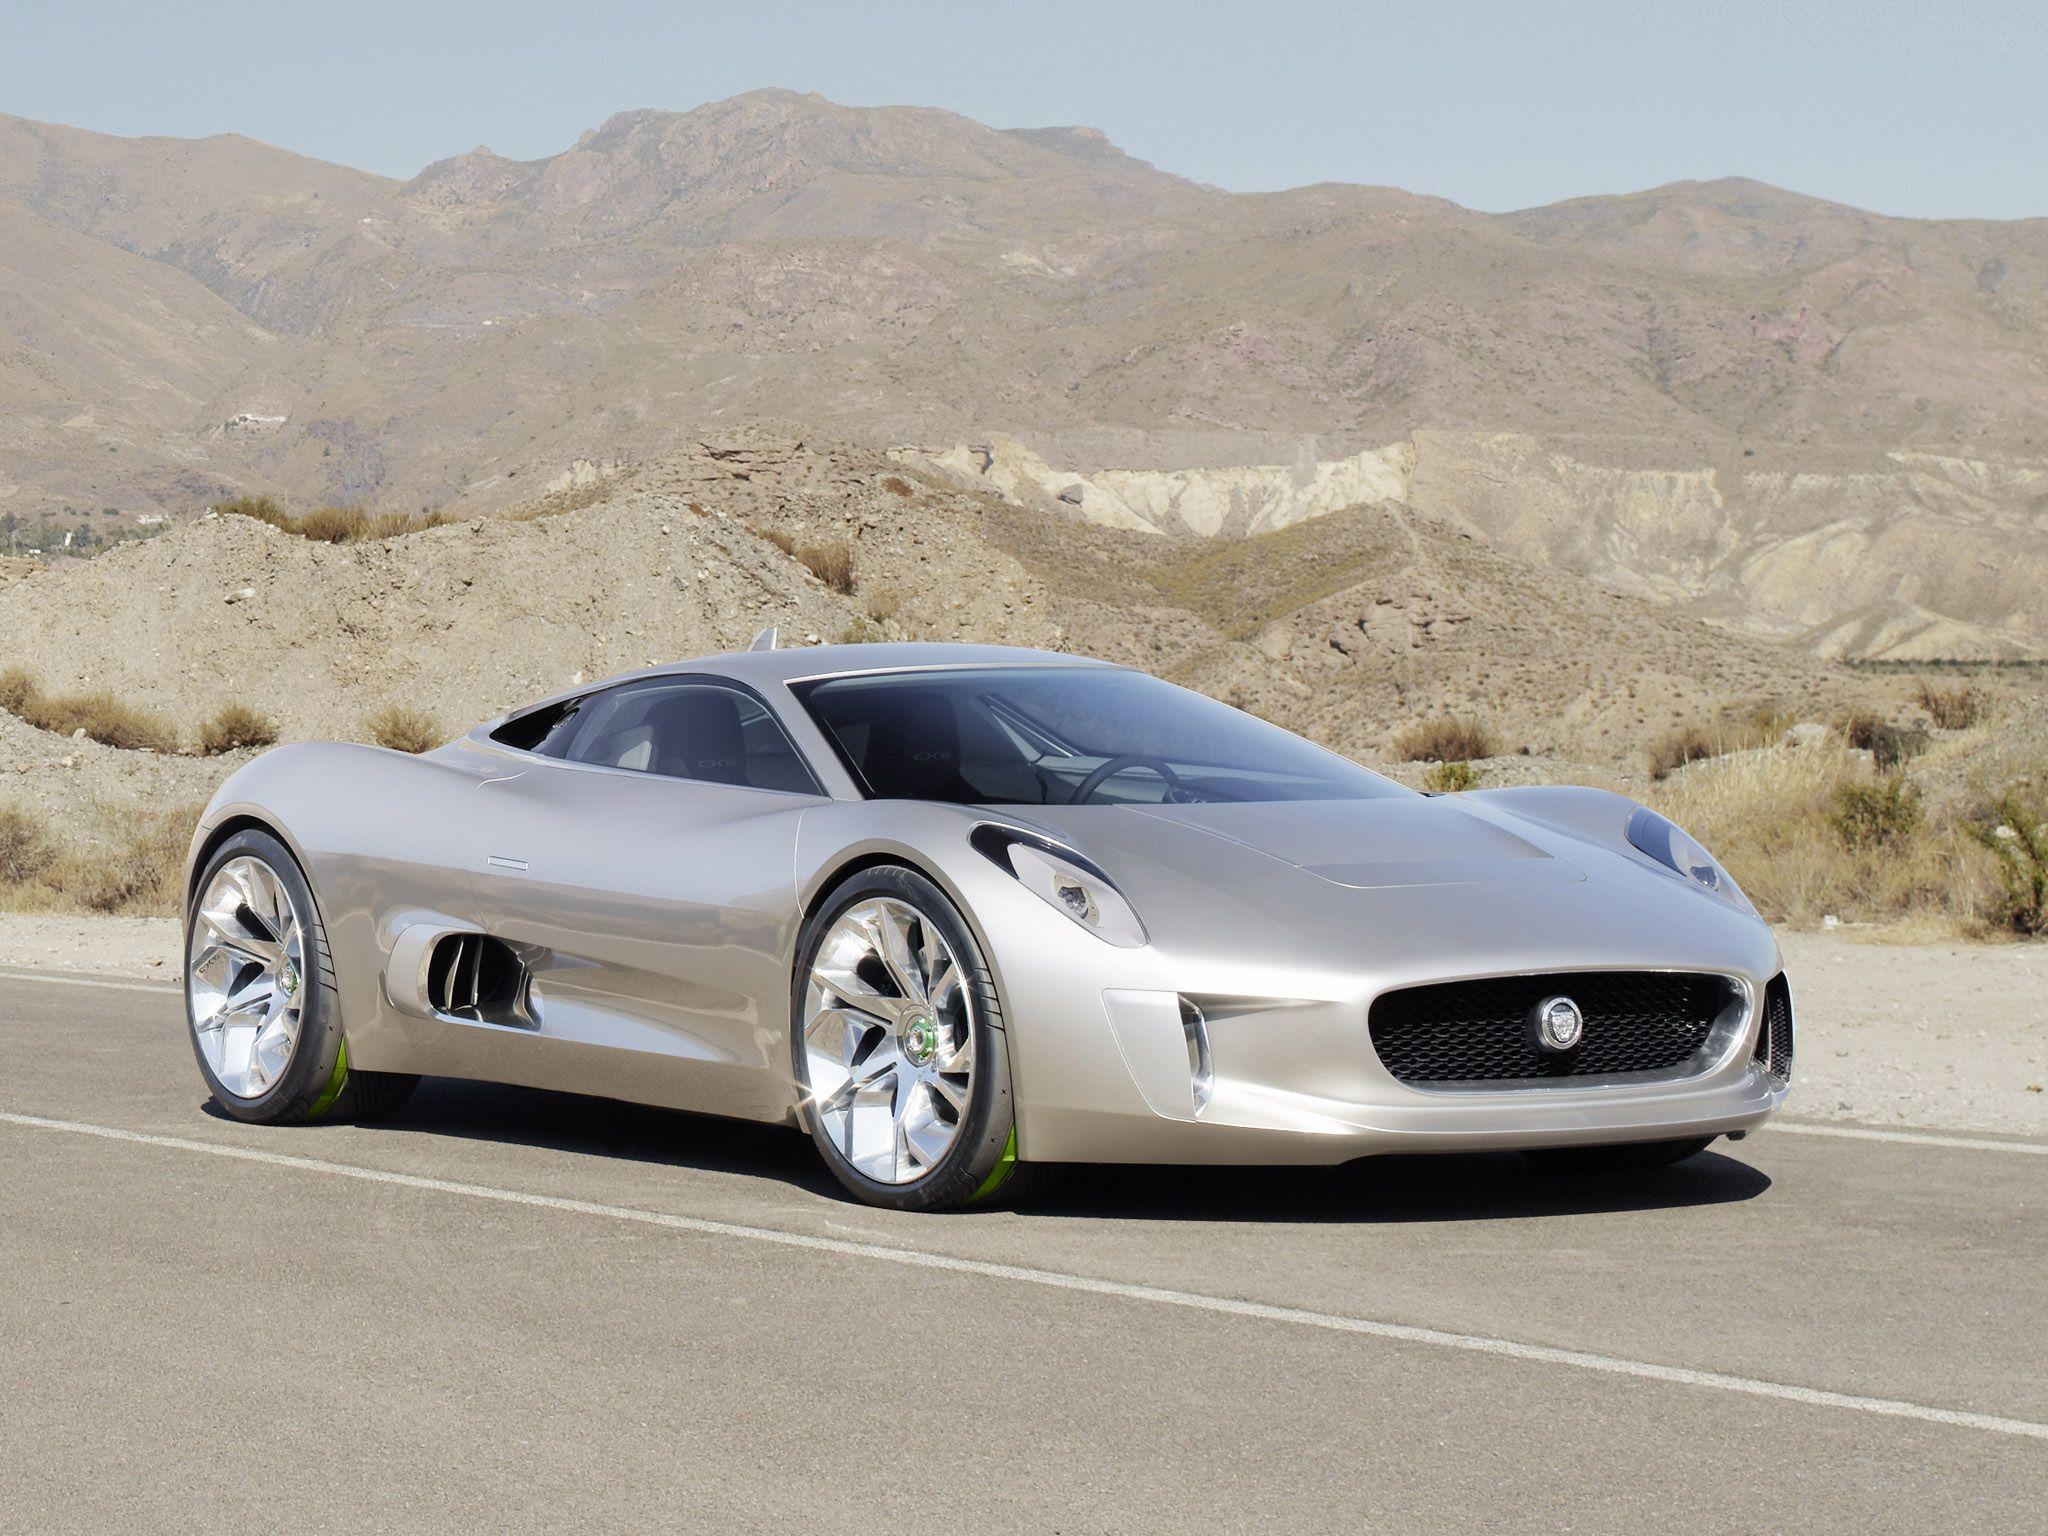 jaguar c xf 2007 - Buscar con Google   Jaguar, Jaguar ...